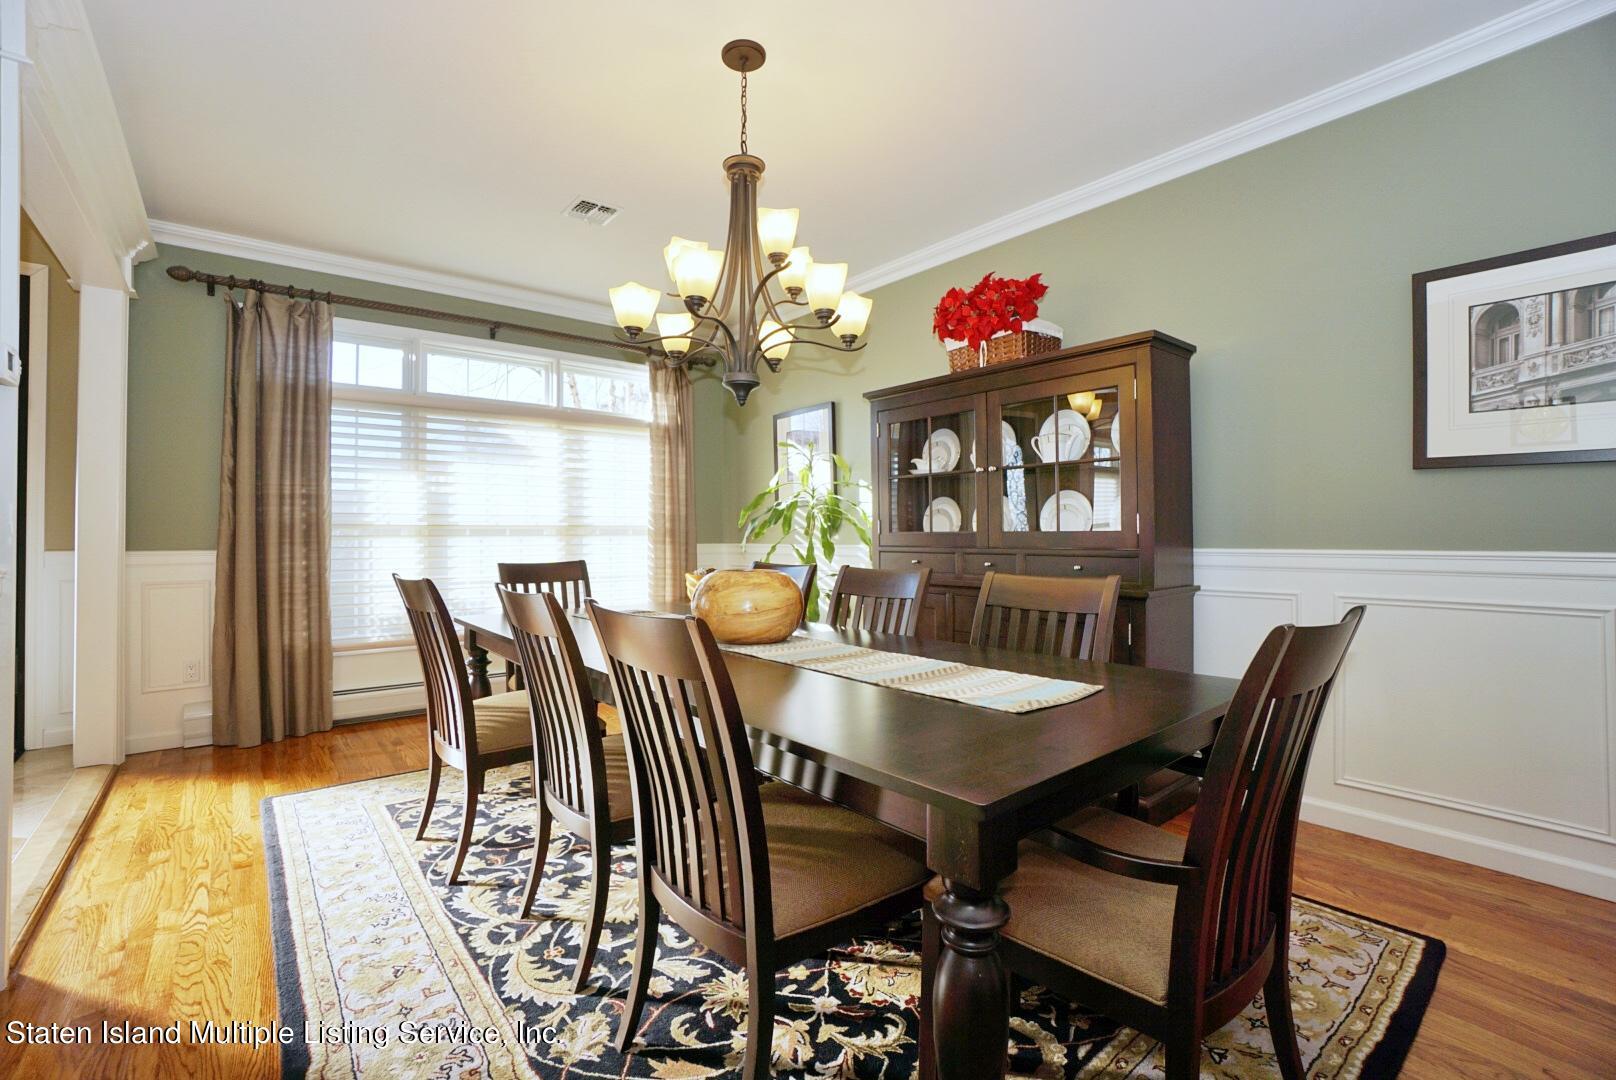 Single Family - Detached 31 Belwood Loop  Staten Island, NY 10307, MLS-1143133-12